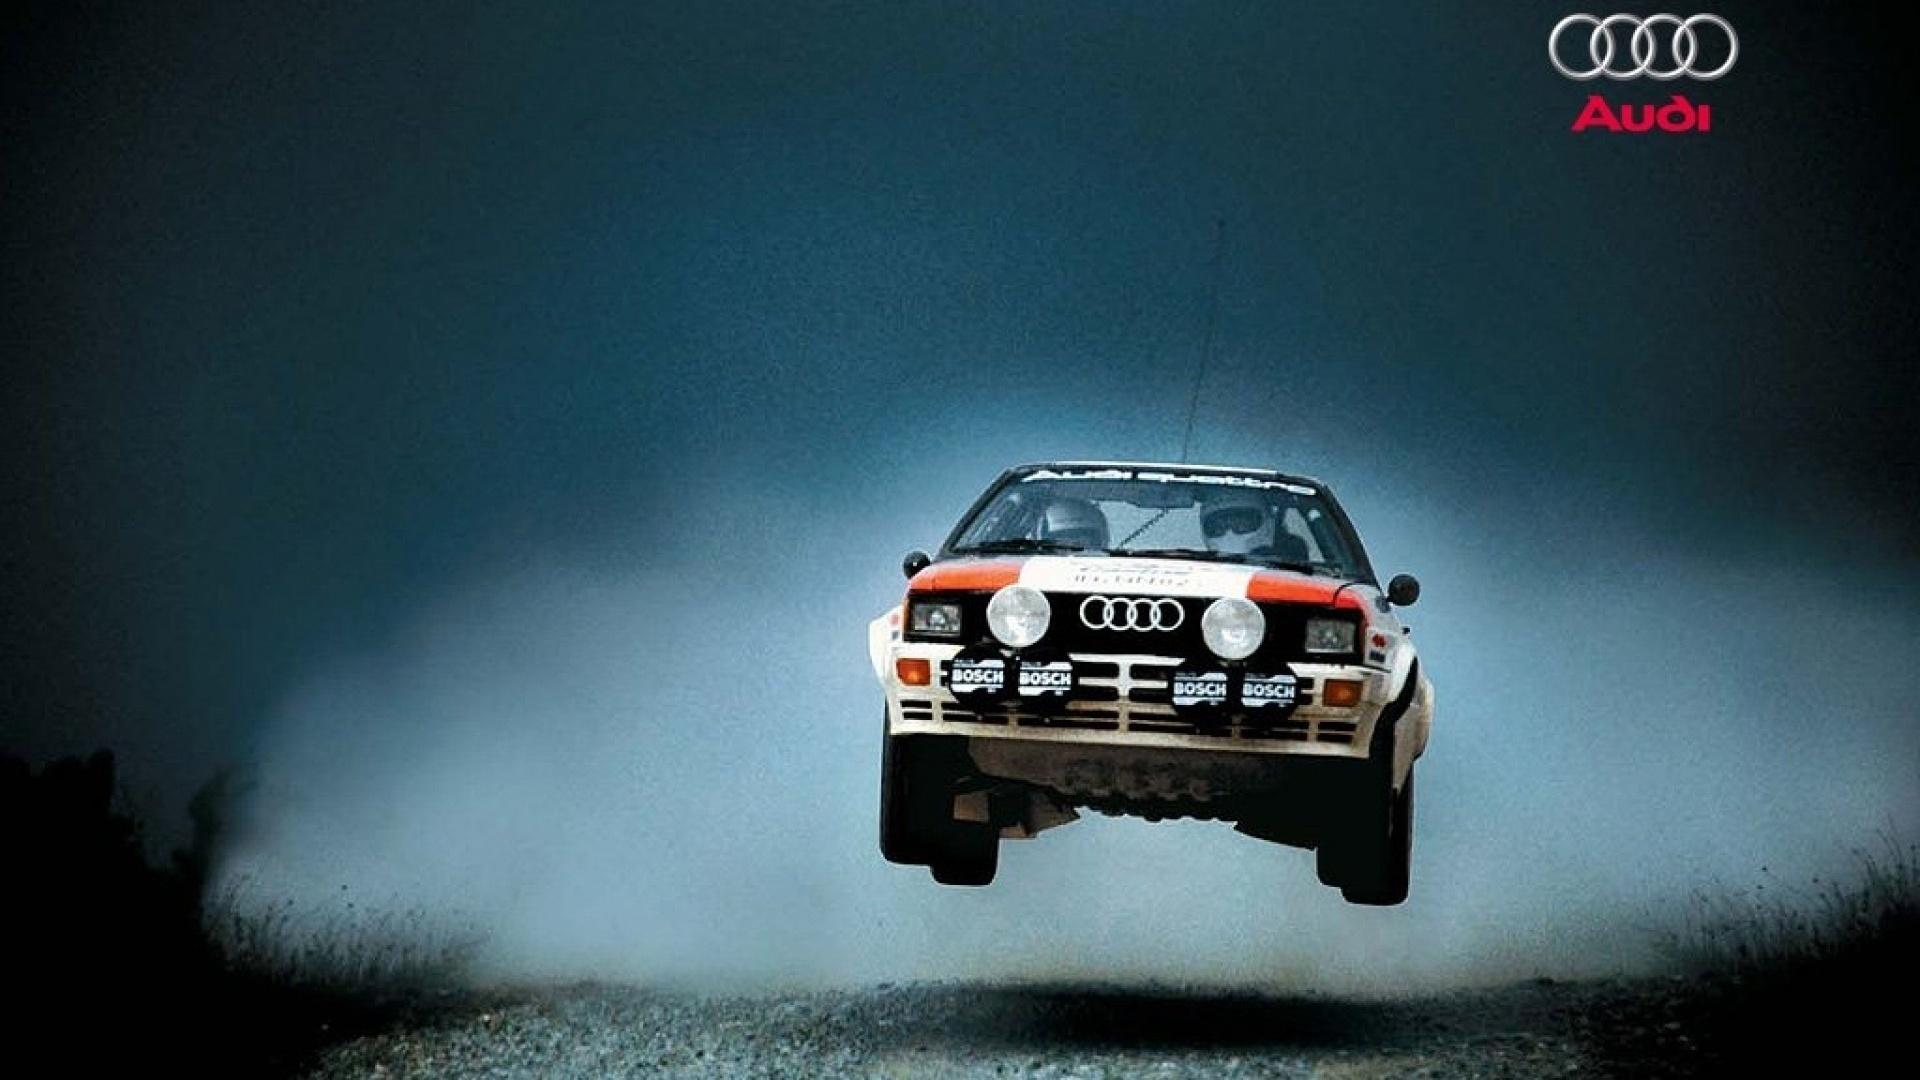 Audi Quattro Wallpapers 75P566Q 037 Mb   4USkY 1920x1080